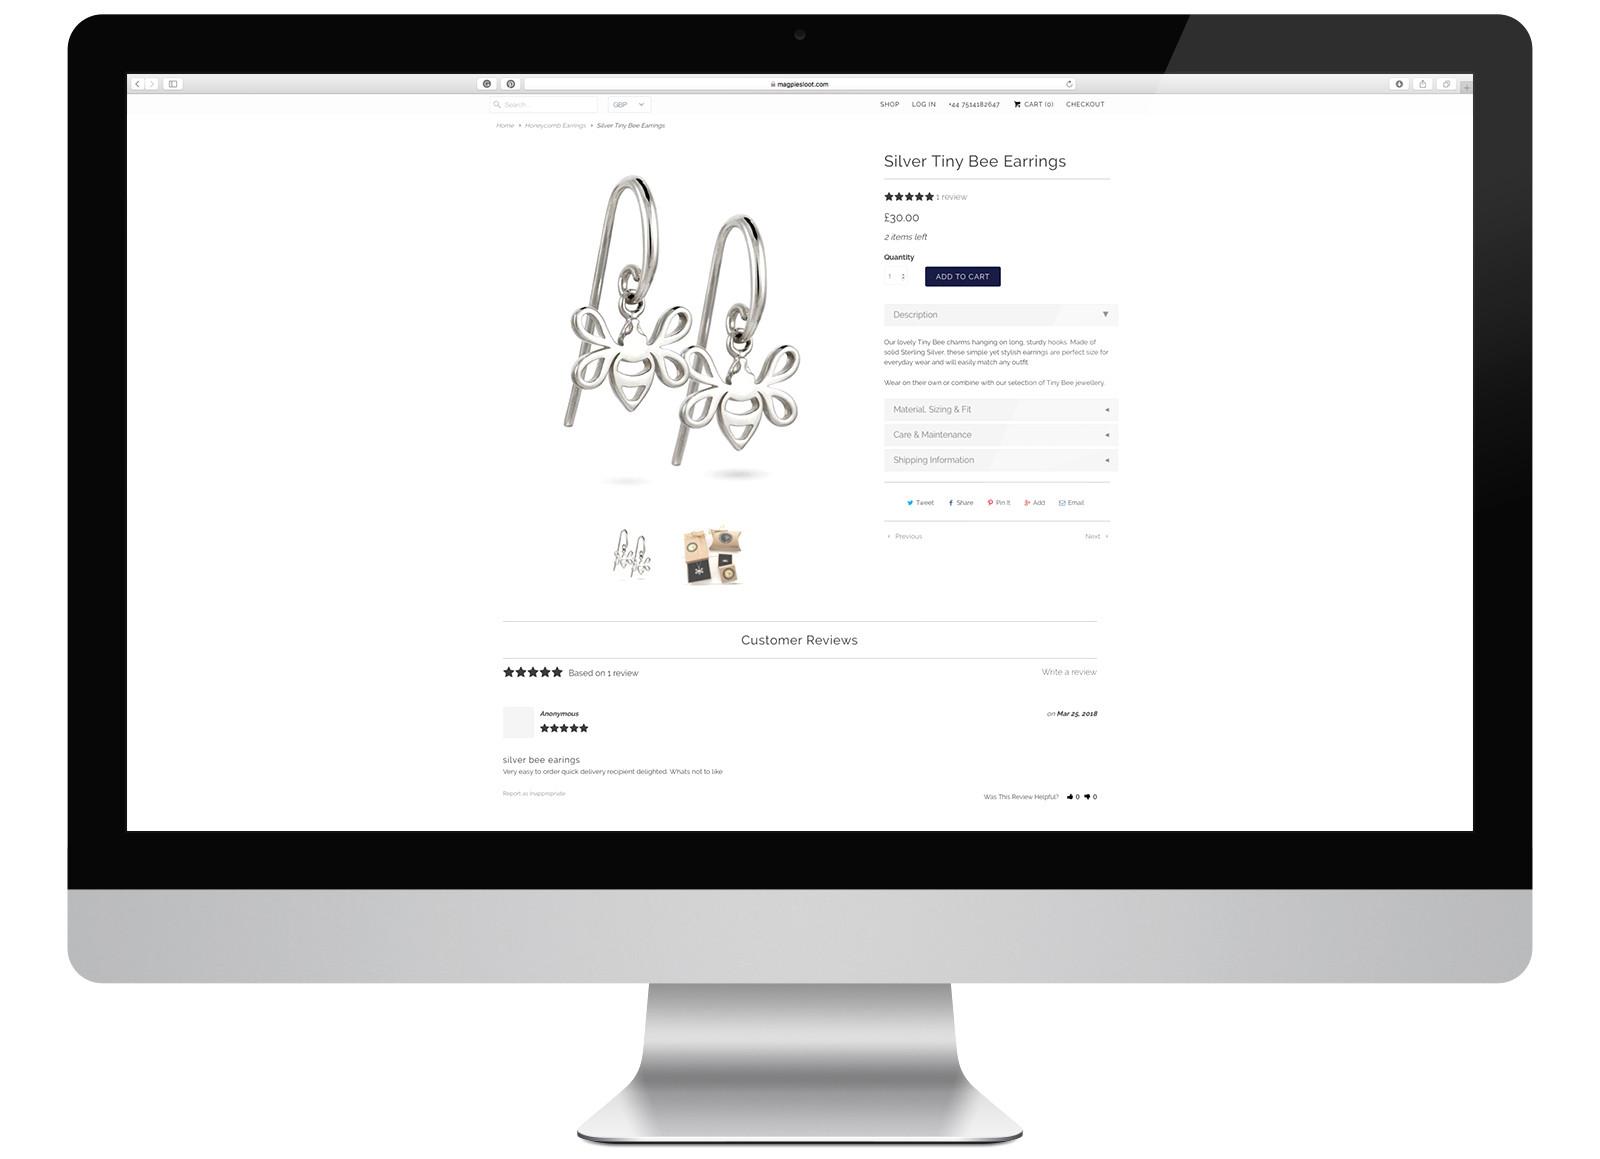 magpies-loot-webdesign-2-martin-marcin-r